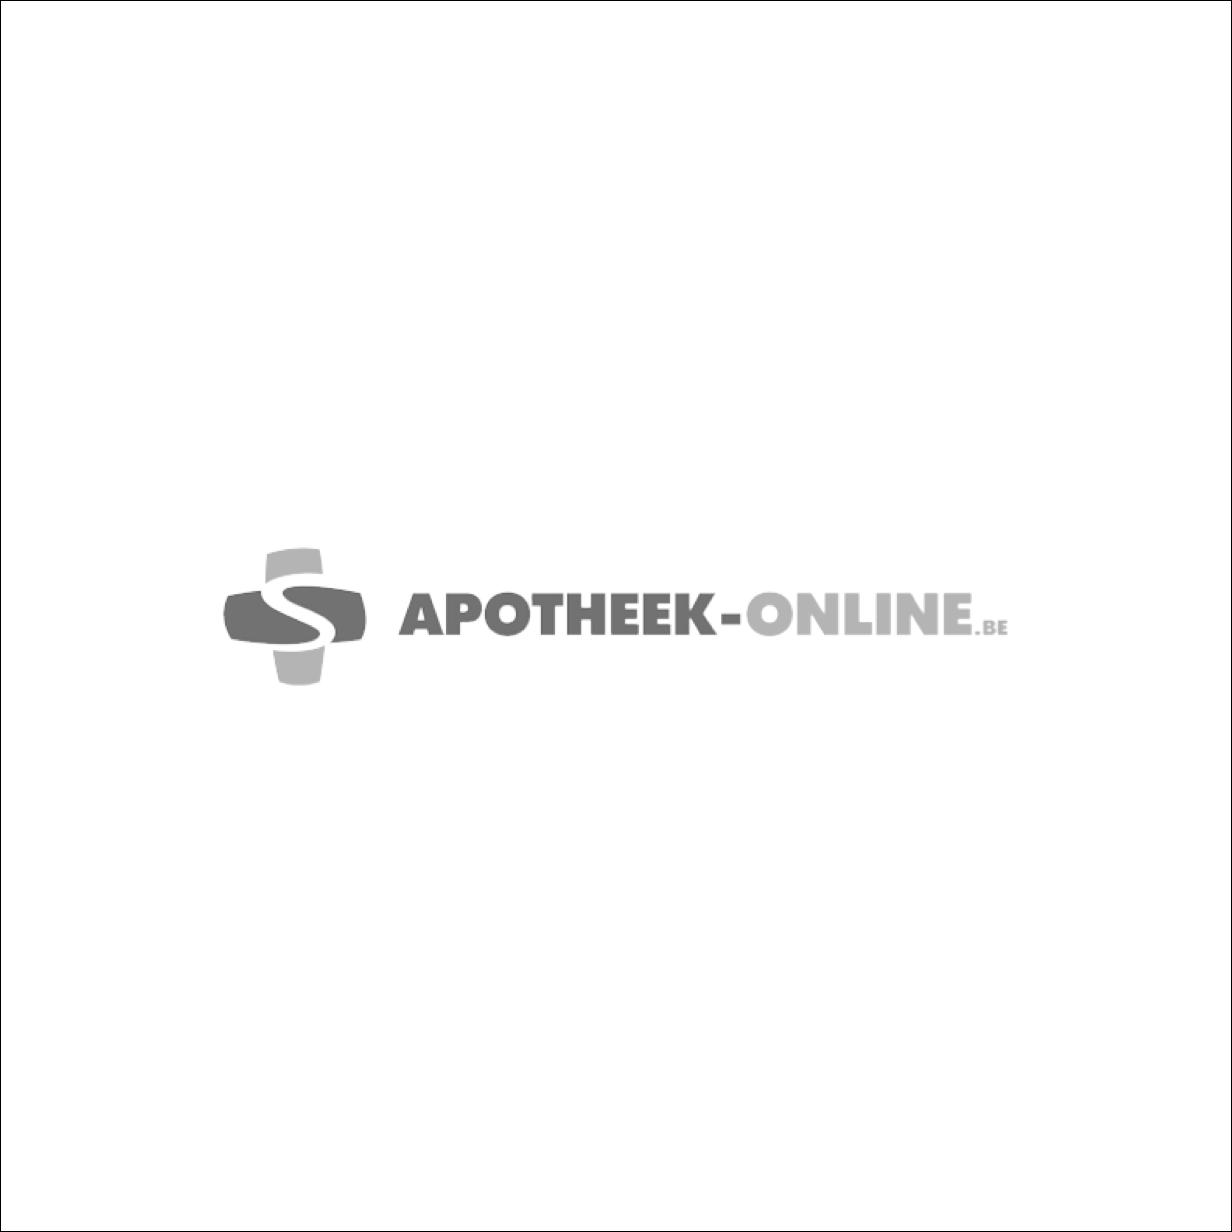 Bota Thorax Es Homme Velcro H 16cm L